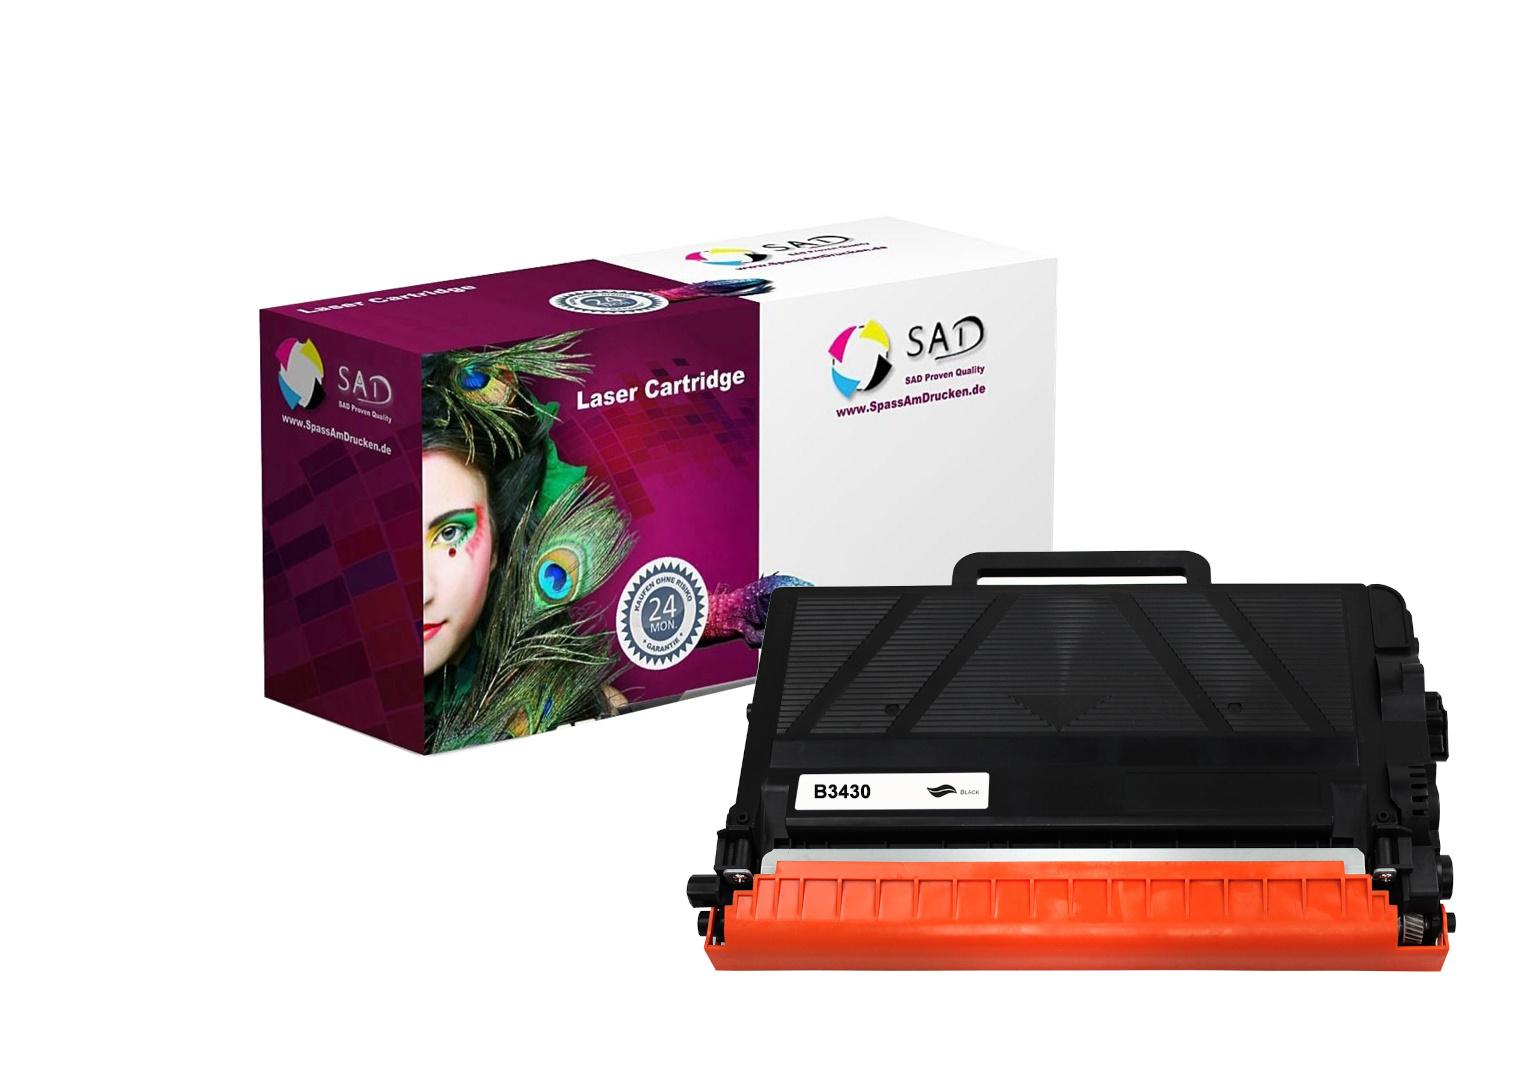 SAD Premium Toner komp. zu Brother TN-3430 schwarz / black